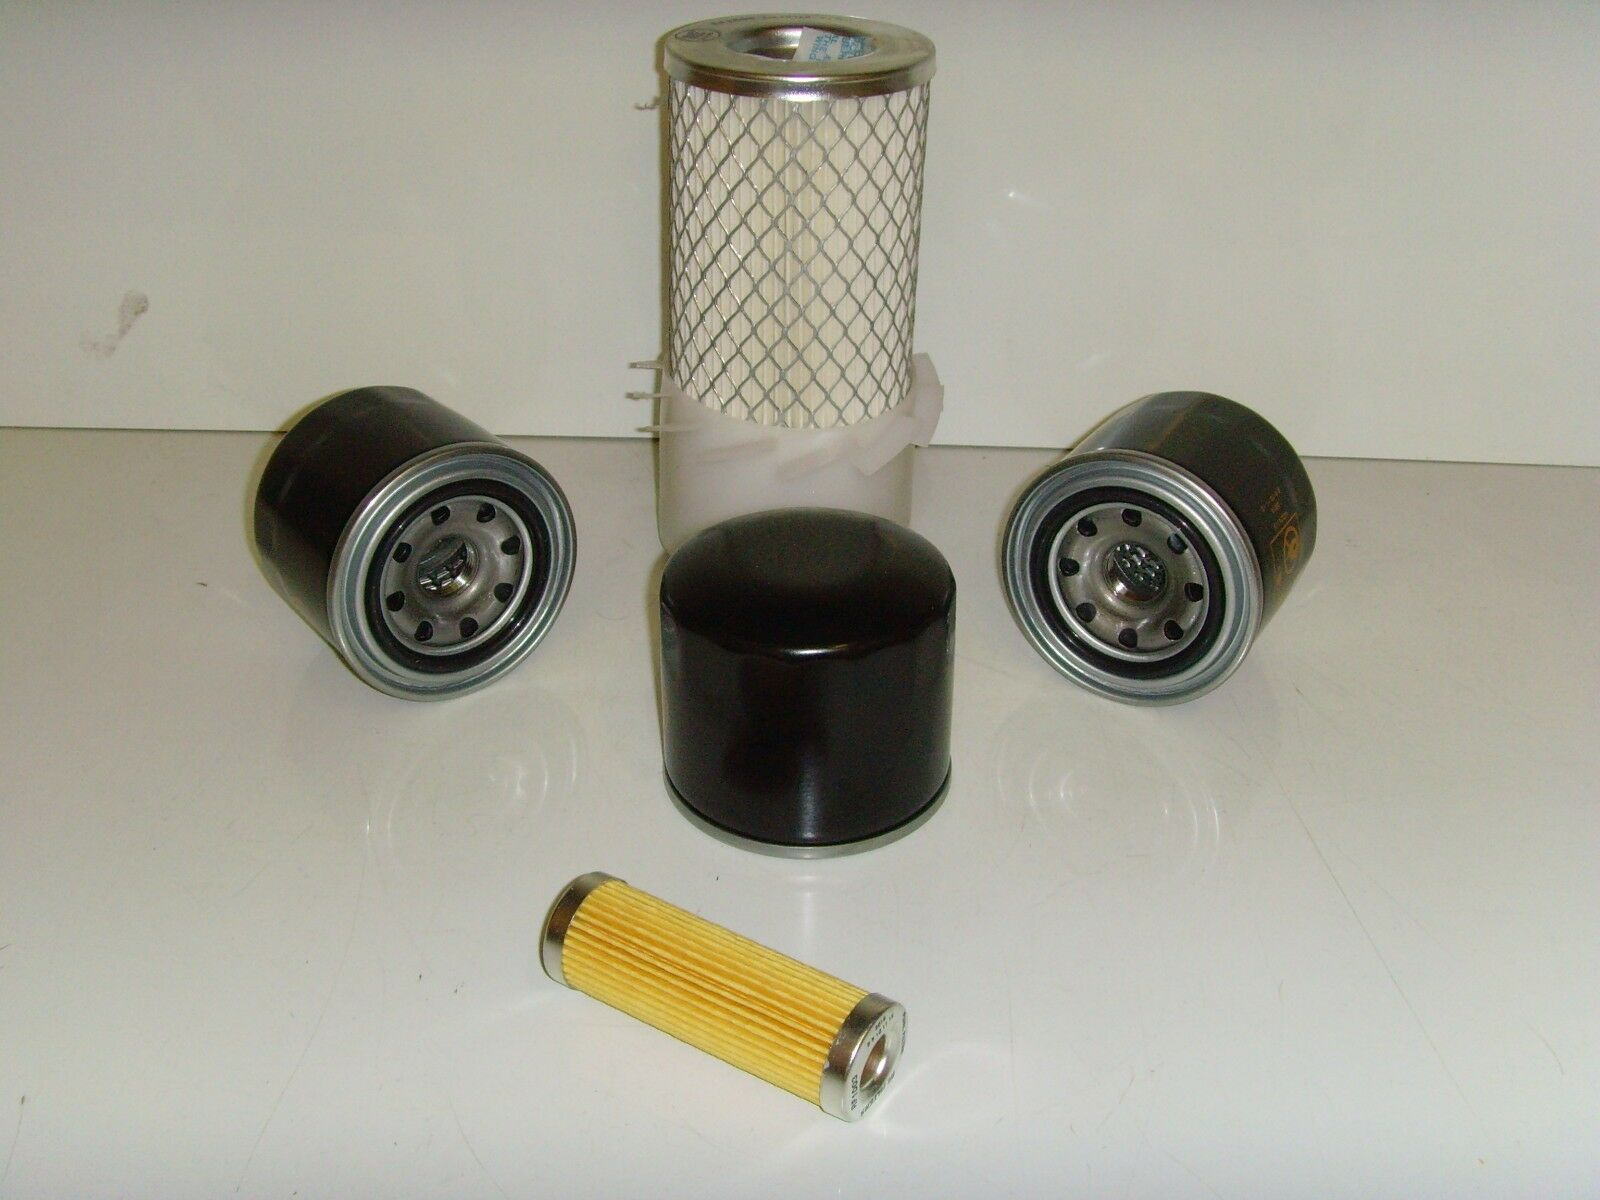 kubota b7001 filter service kit air oil fuel filters. Black Bedroom Furniture Sets. Home Design Ideas